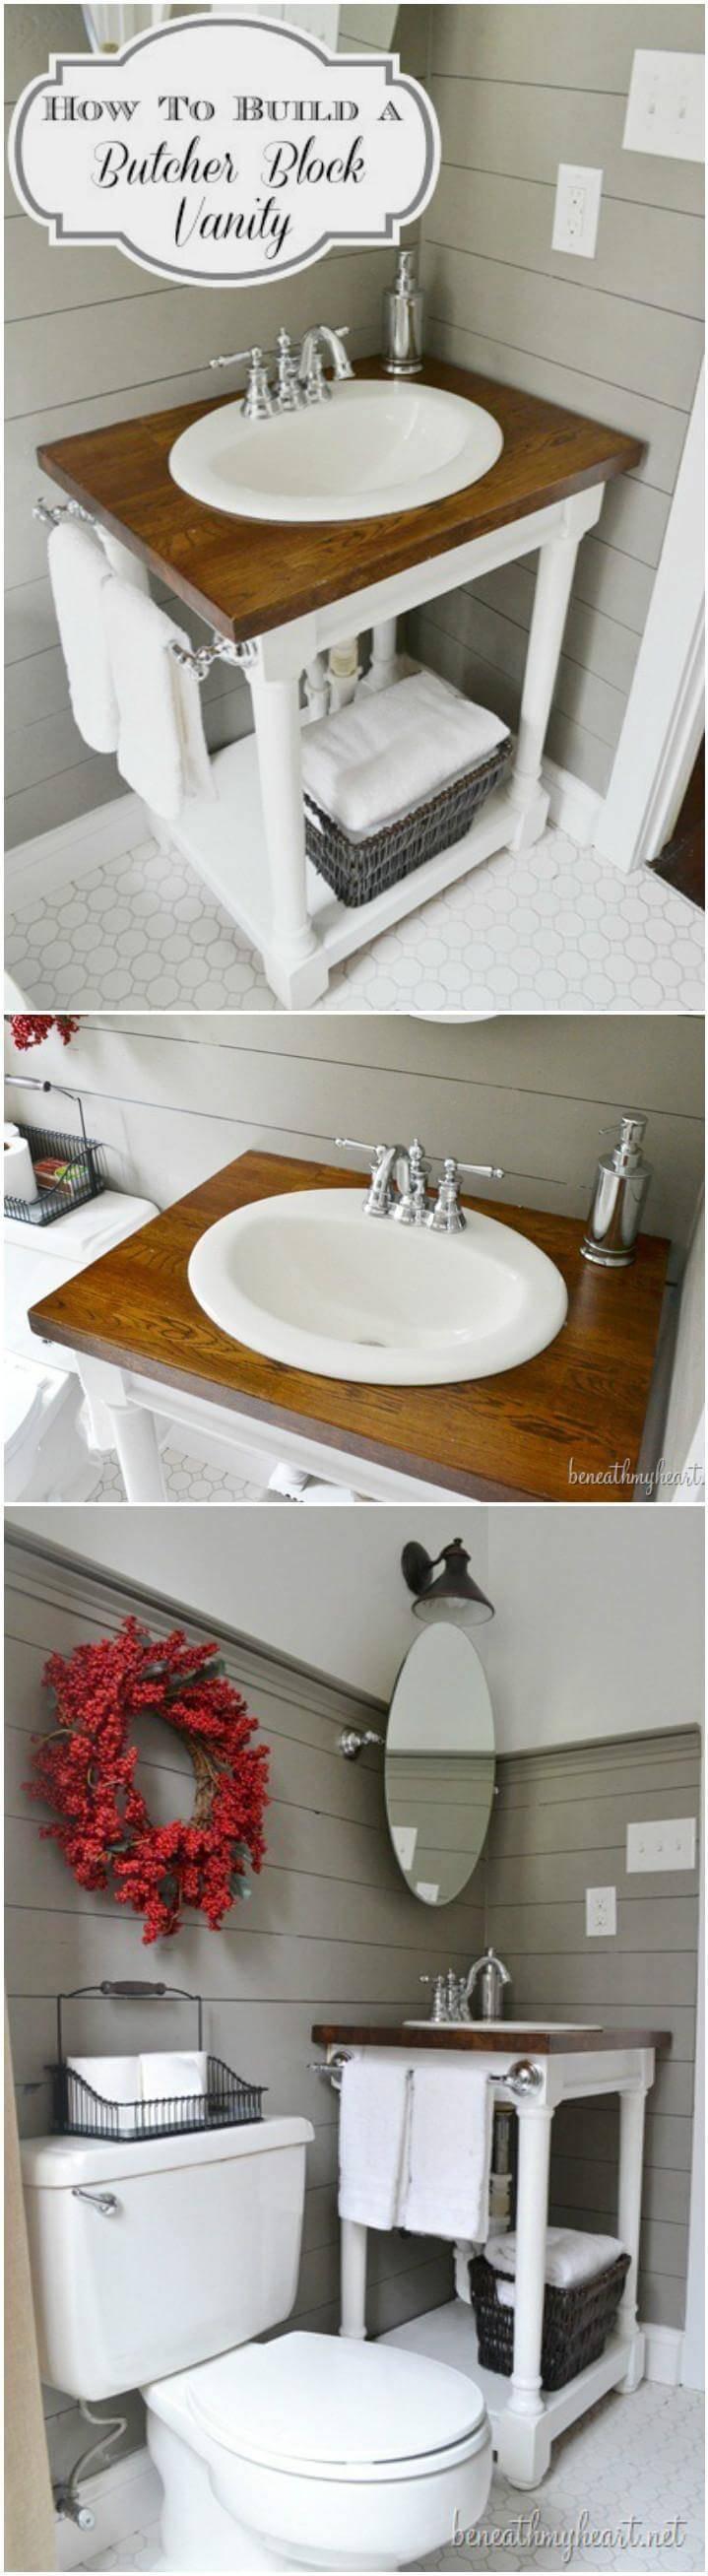 self-installed and made DIY butcher block vanity